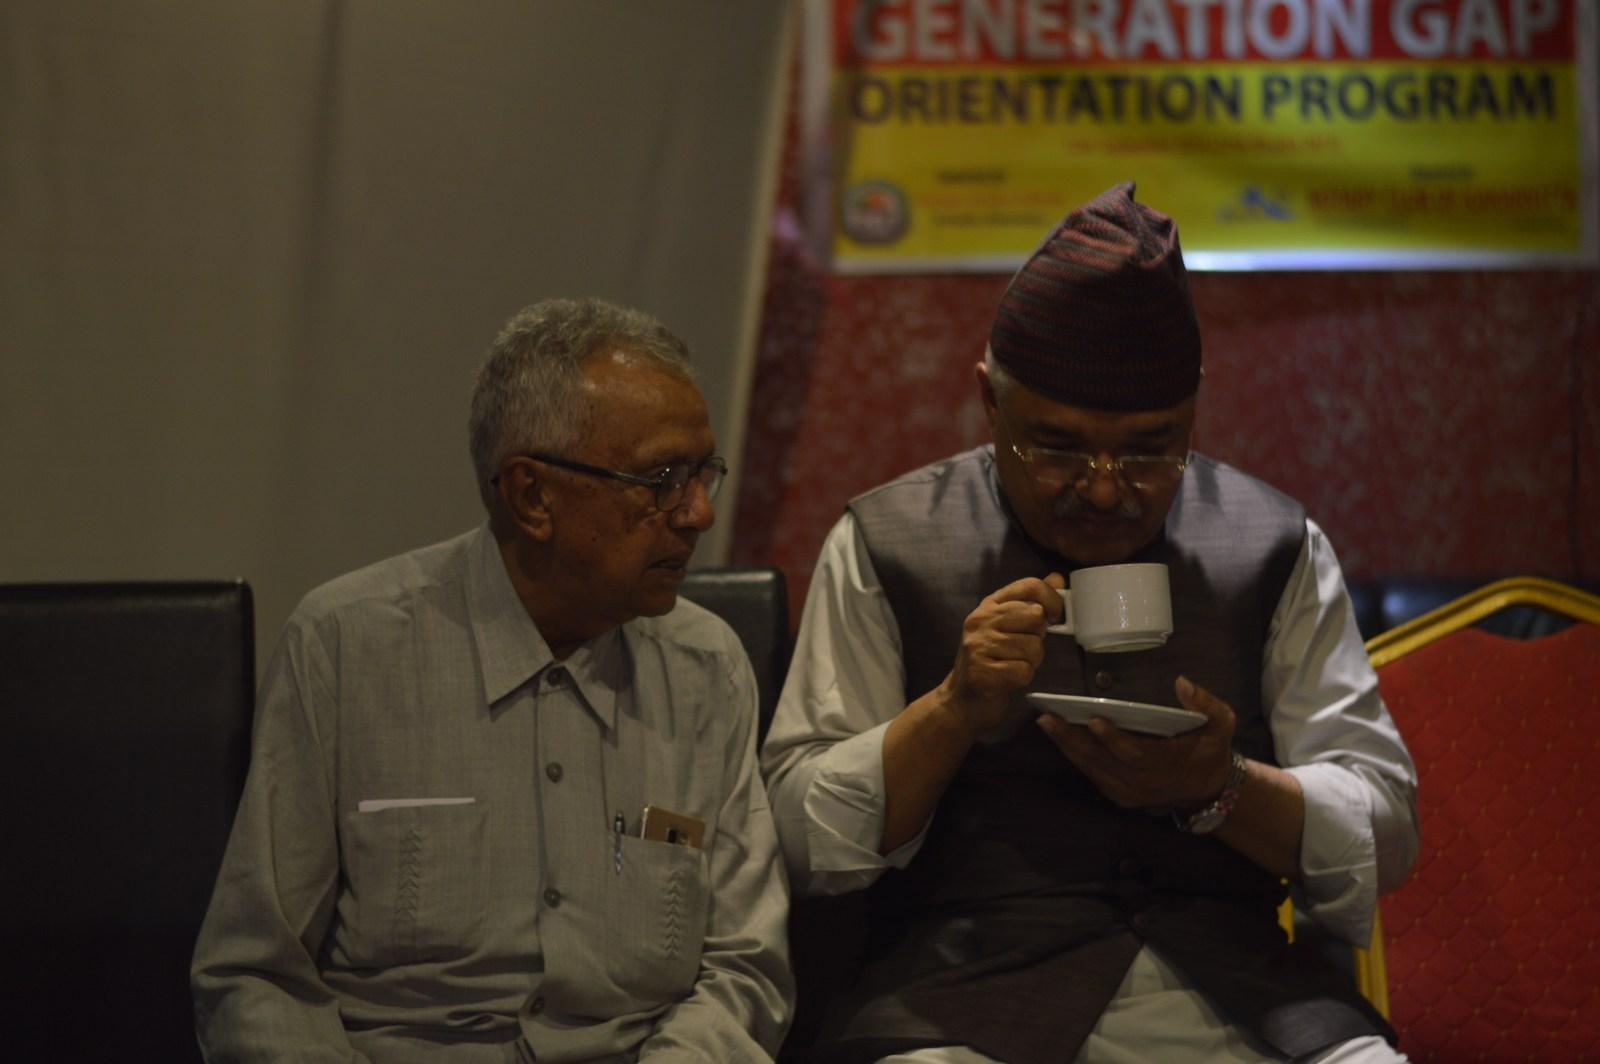 Generation-Gap-Orientation-Program-Rotary-Club-of-Kakarvitta-34